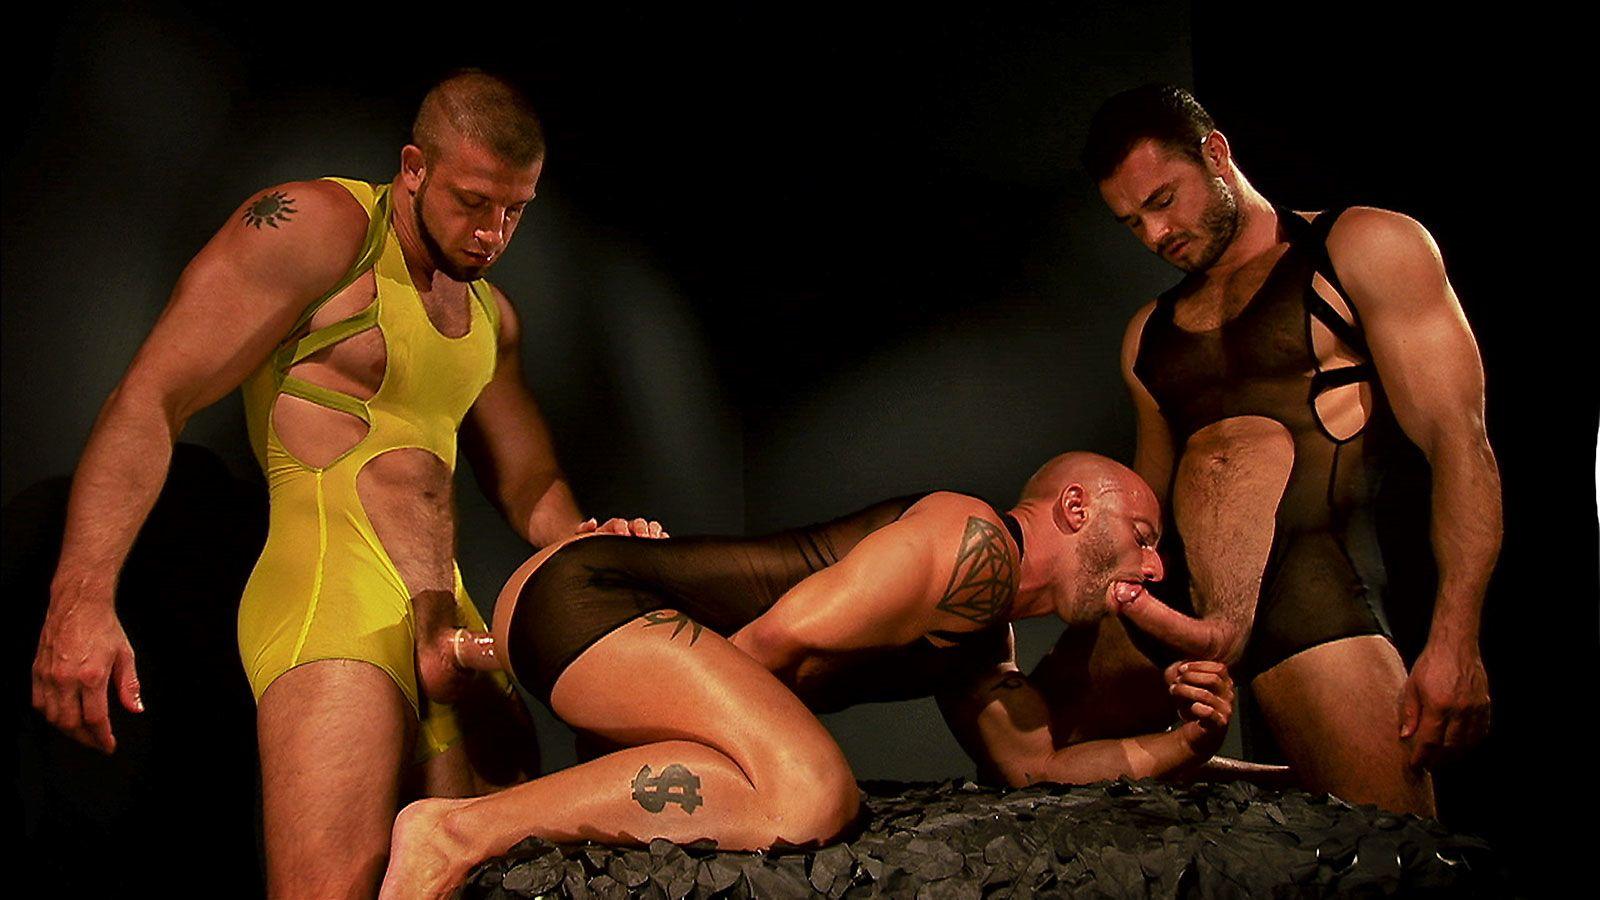 transsexual dancers